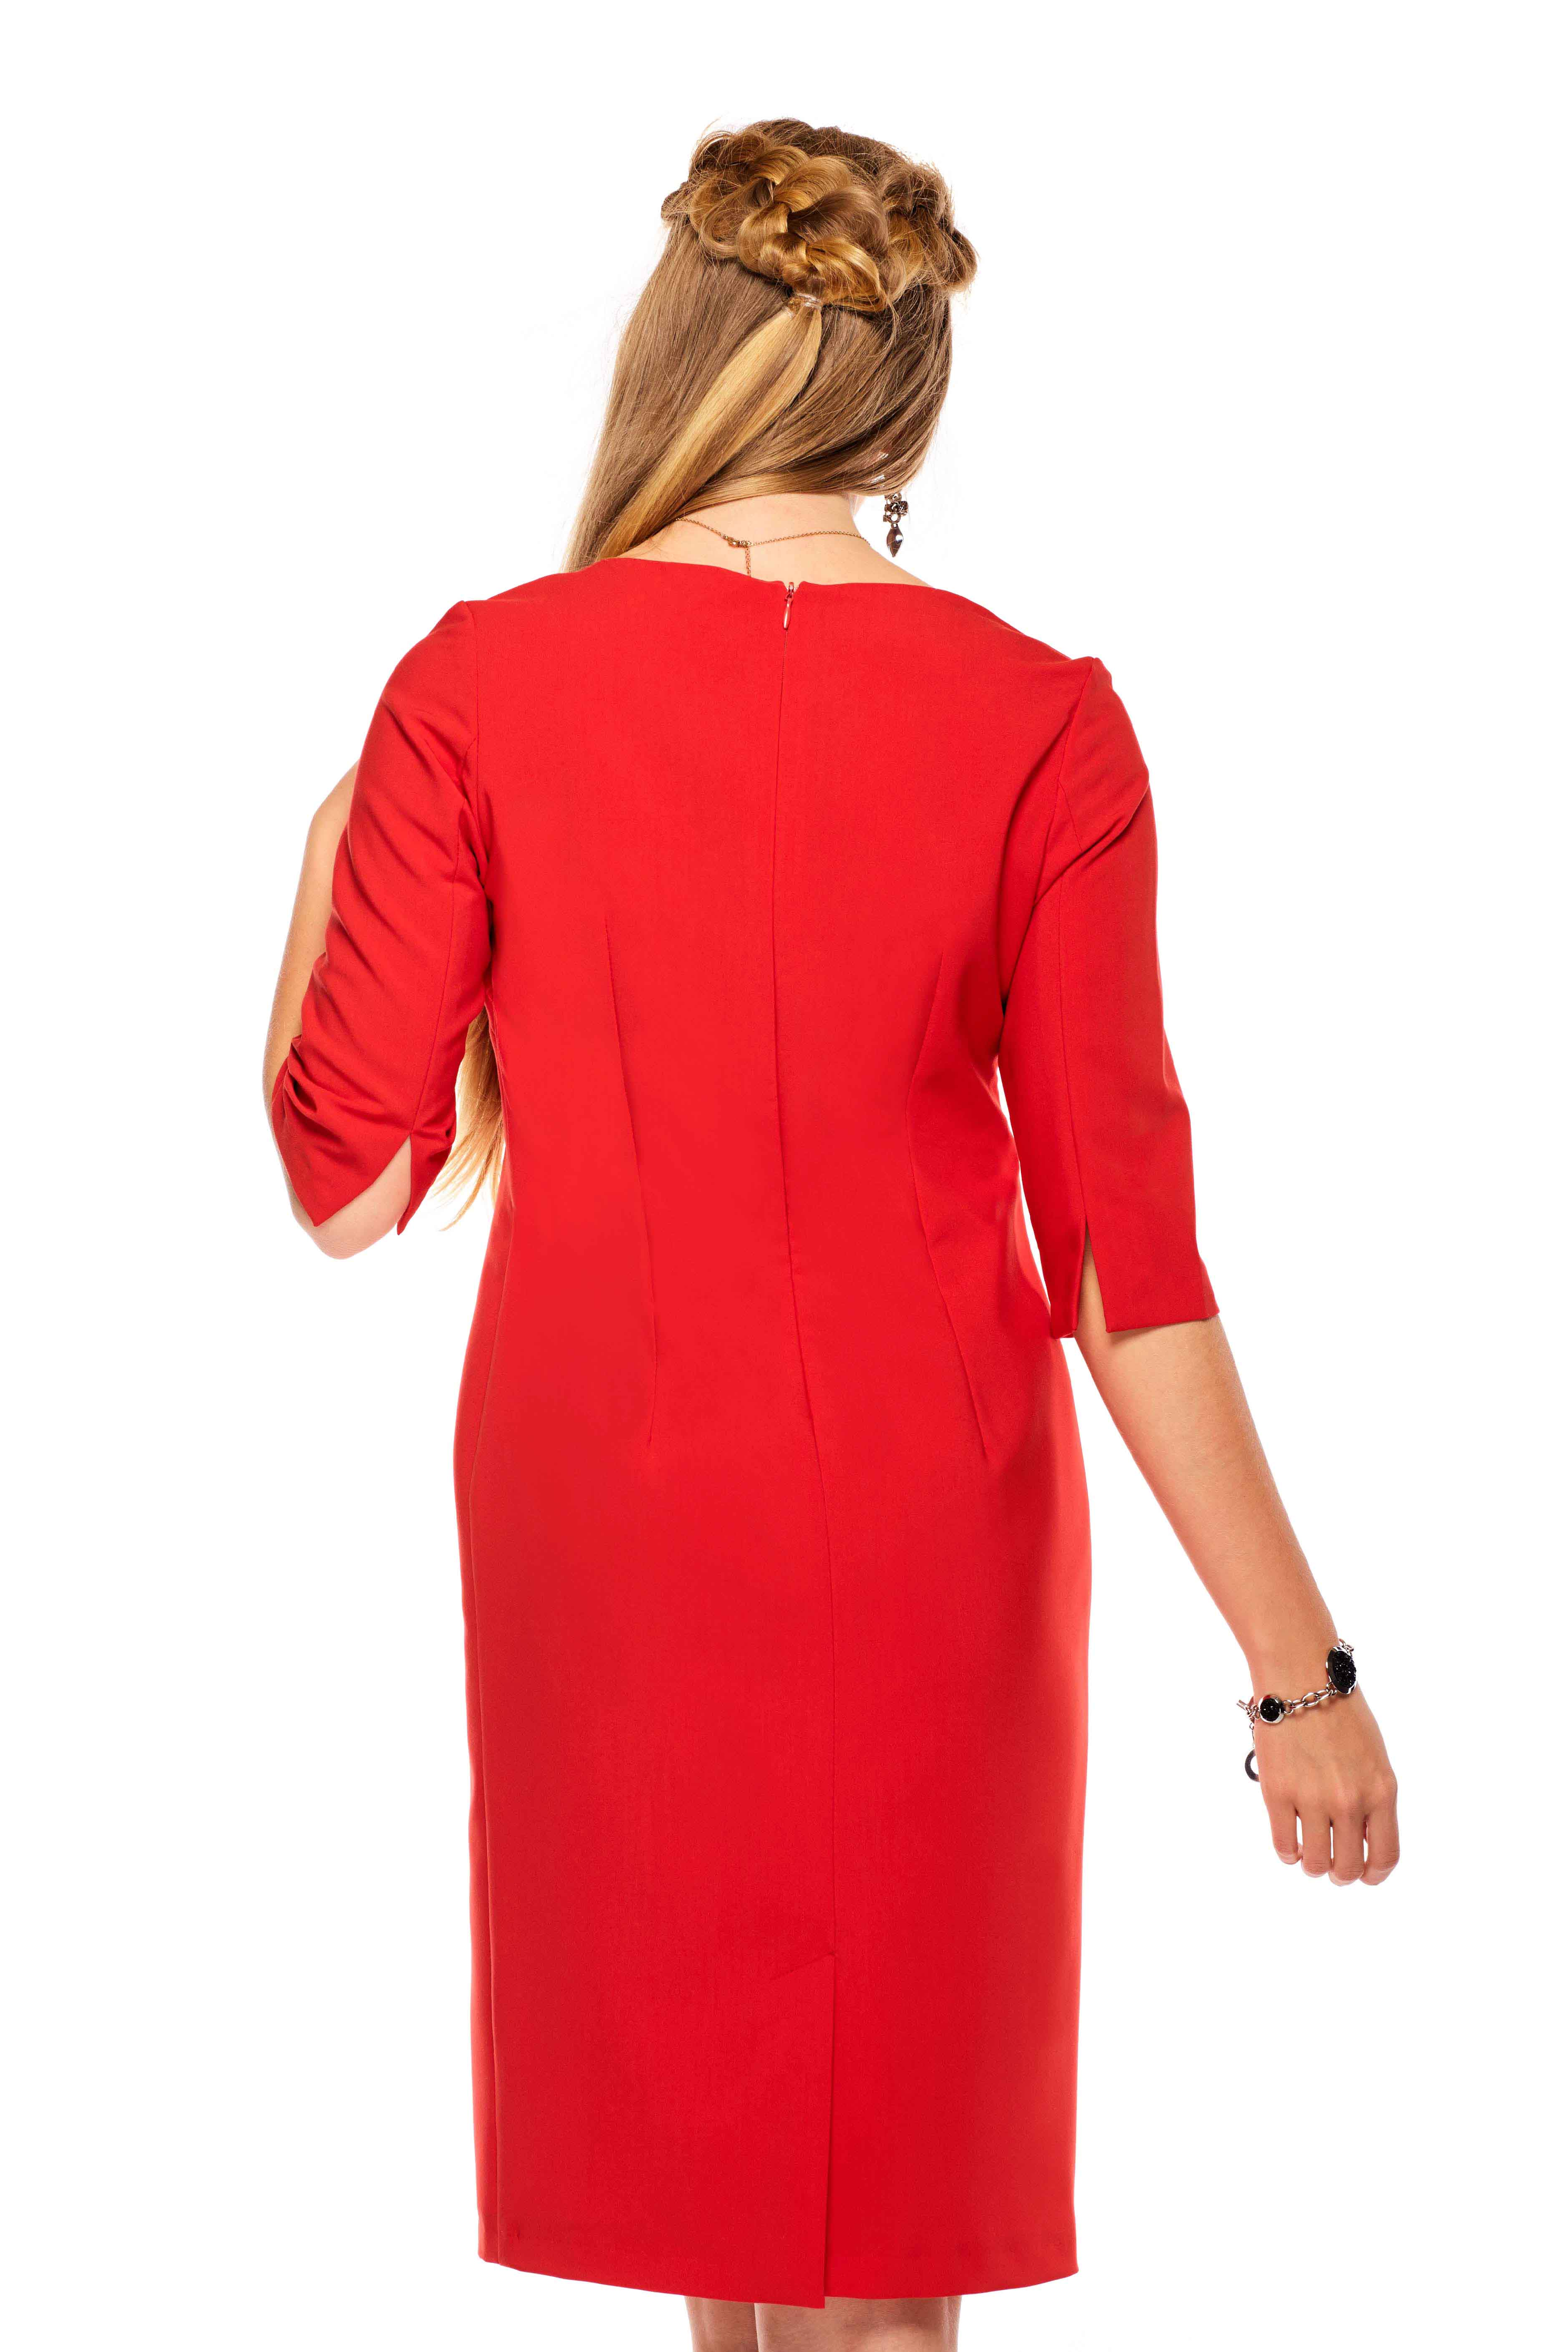 Inga dress in red